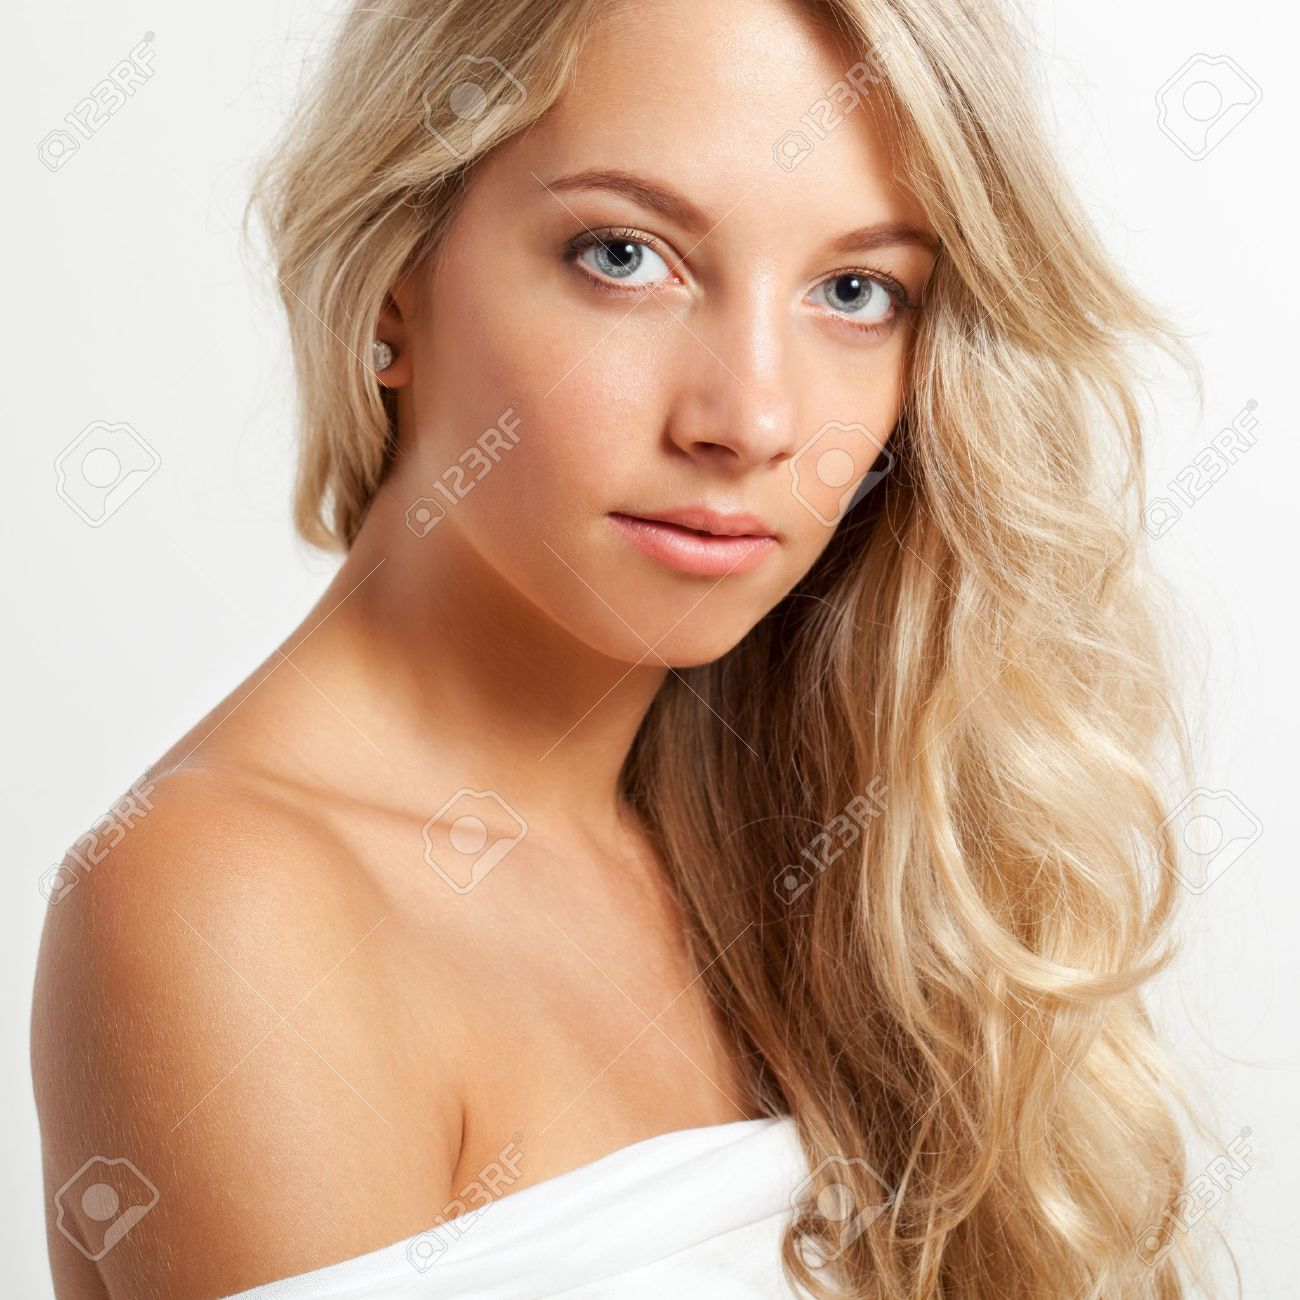 Beautiful Blonde Woman Closeup Face Portrait Square Frame Stock Photo 14525771